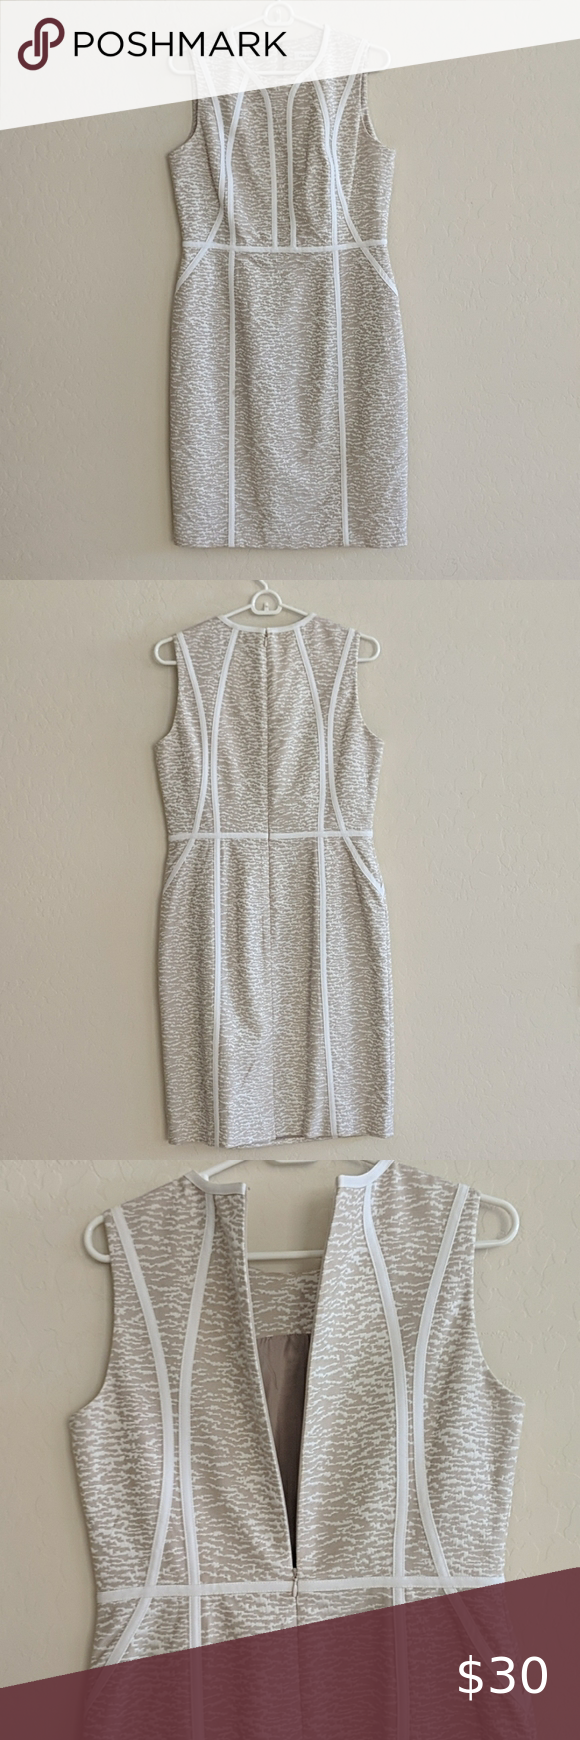 Calvin Klein Tan And White Dress Size 8 Euc Calvin Klein Tan And White Dress Size 8 Eu Black Short Sleeve Dress Womens Sheath Dress Fitted Sheath Dress [ 1740 x 580 Pixel ]